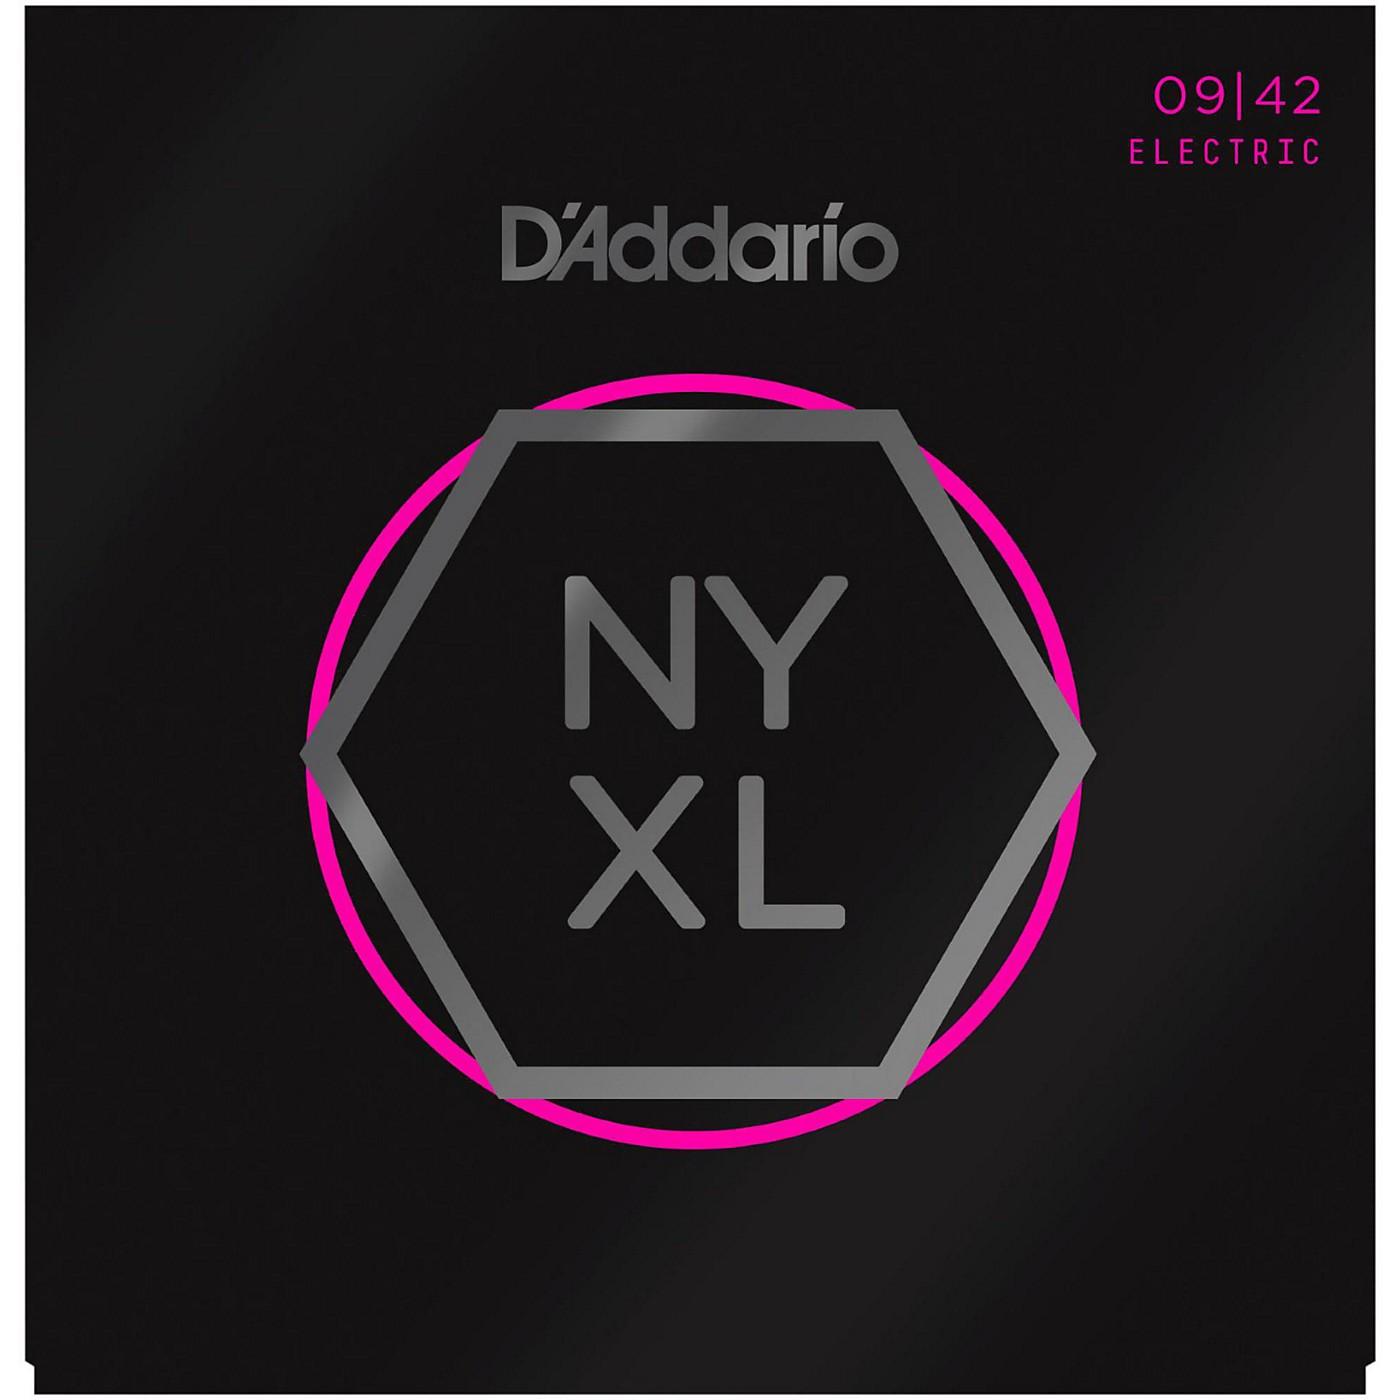 D'Addario NYXL0942 Super Light Electric Guitar Strings thumbnail